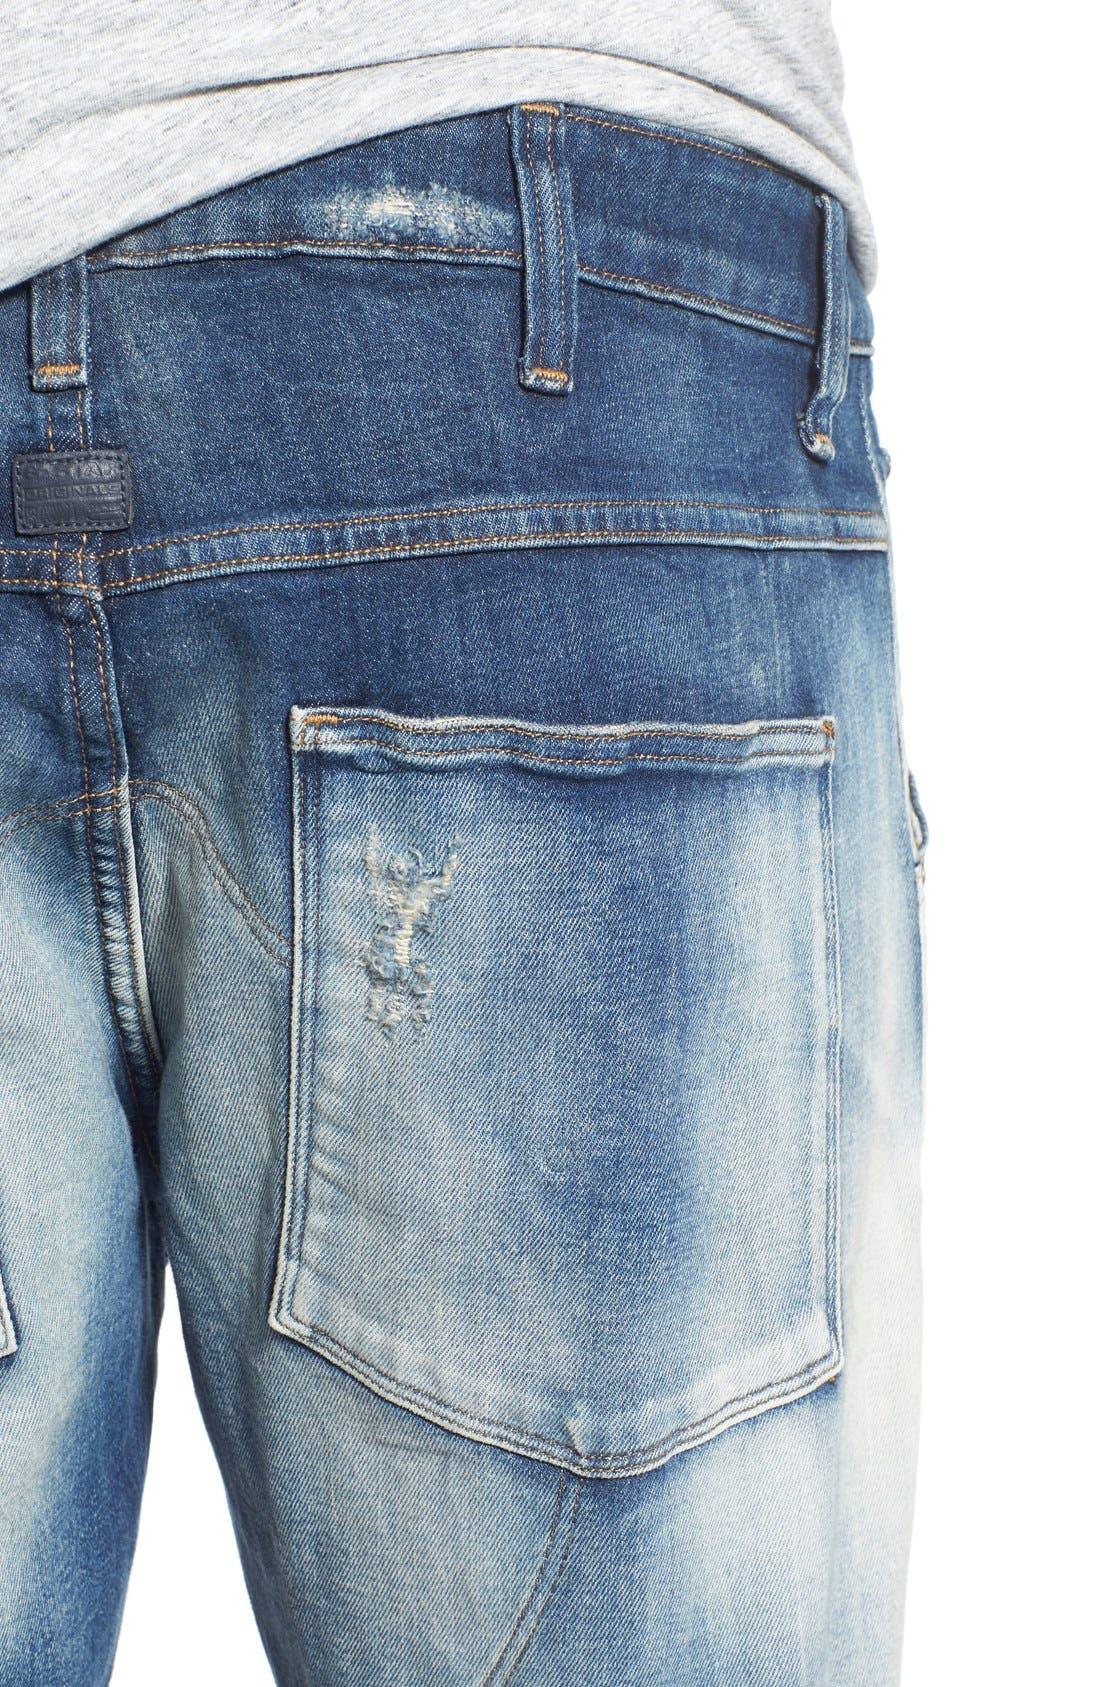 Alternate Image 4  - G-Star Raw '5620 Type C' Skinny Fit Moto Jeans (Moon Wash Restored)